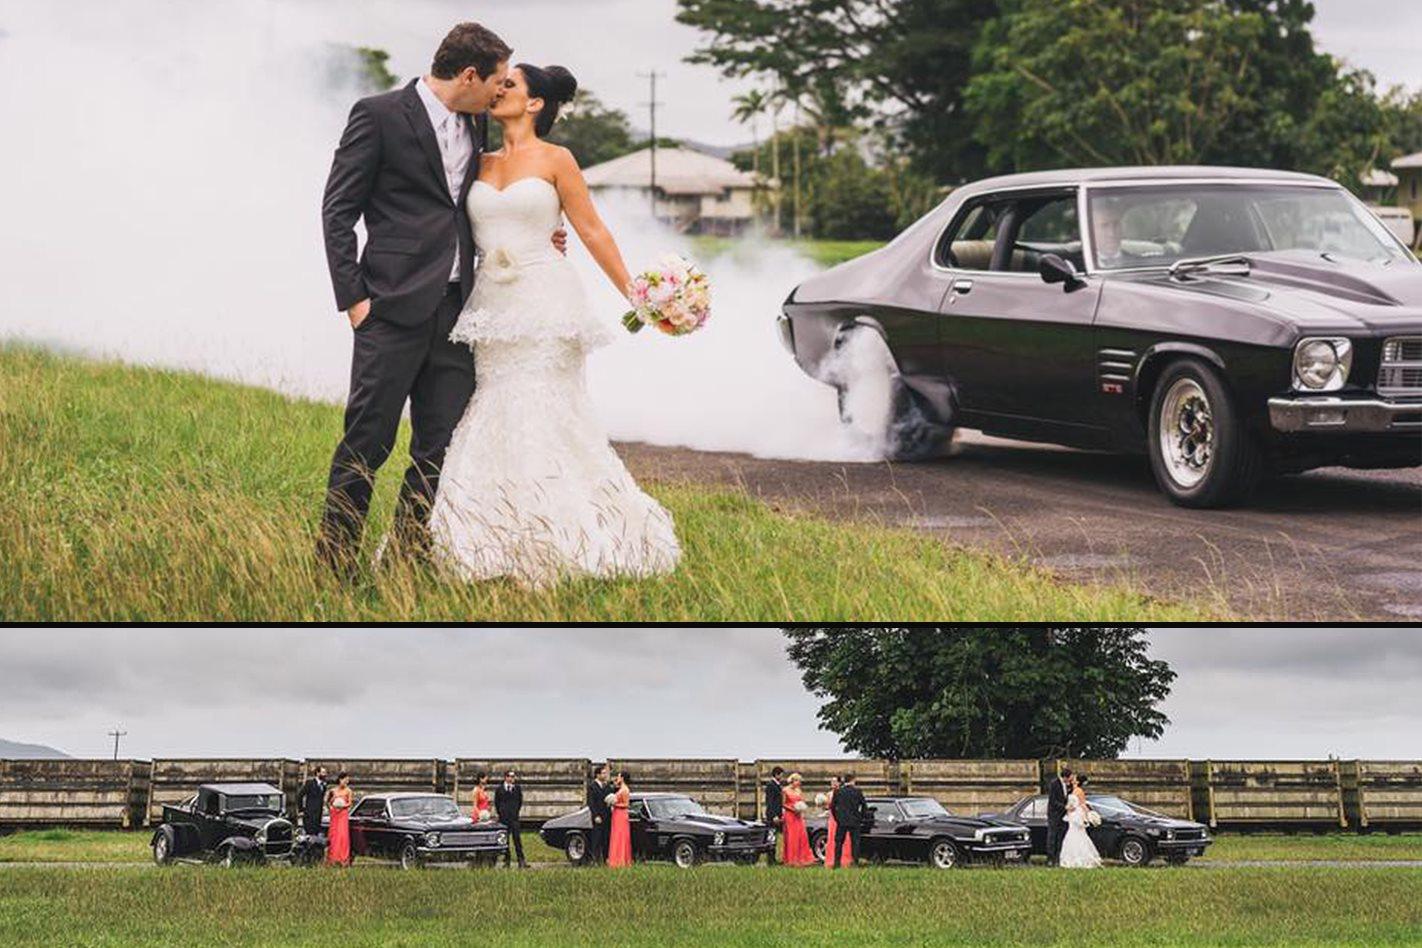 Brad Hanrahan's wedding cars